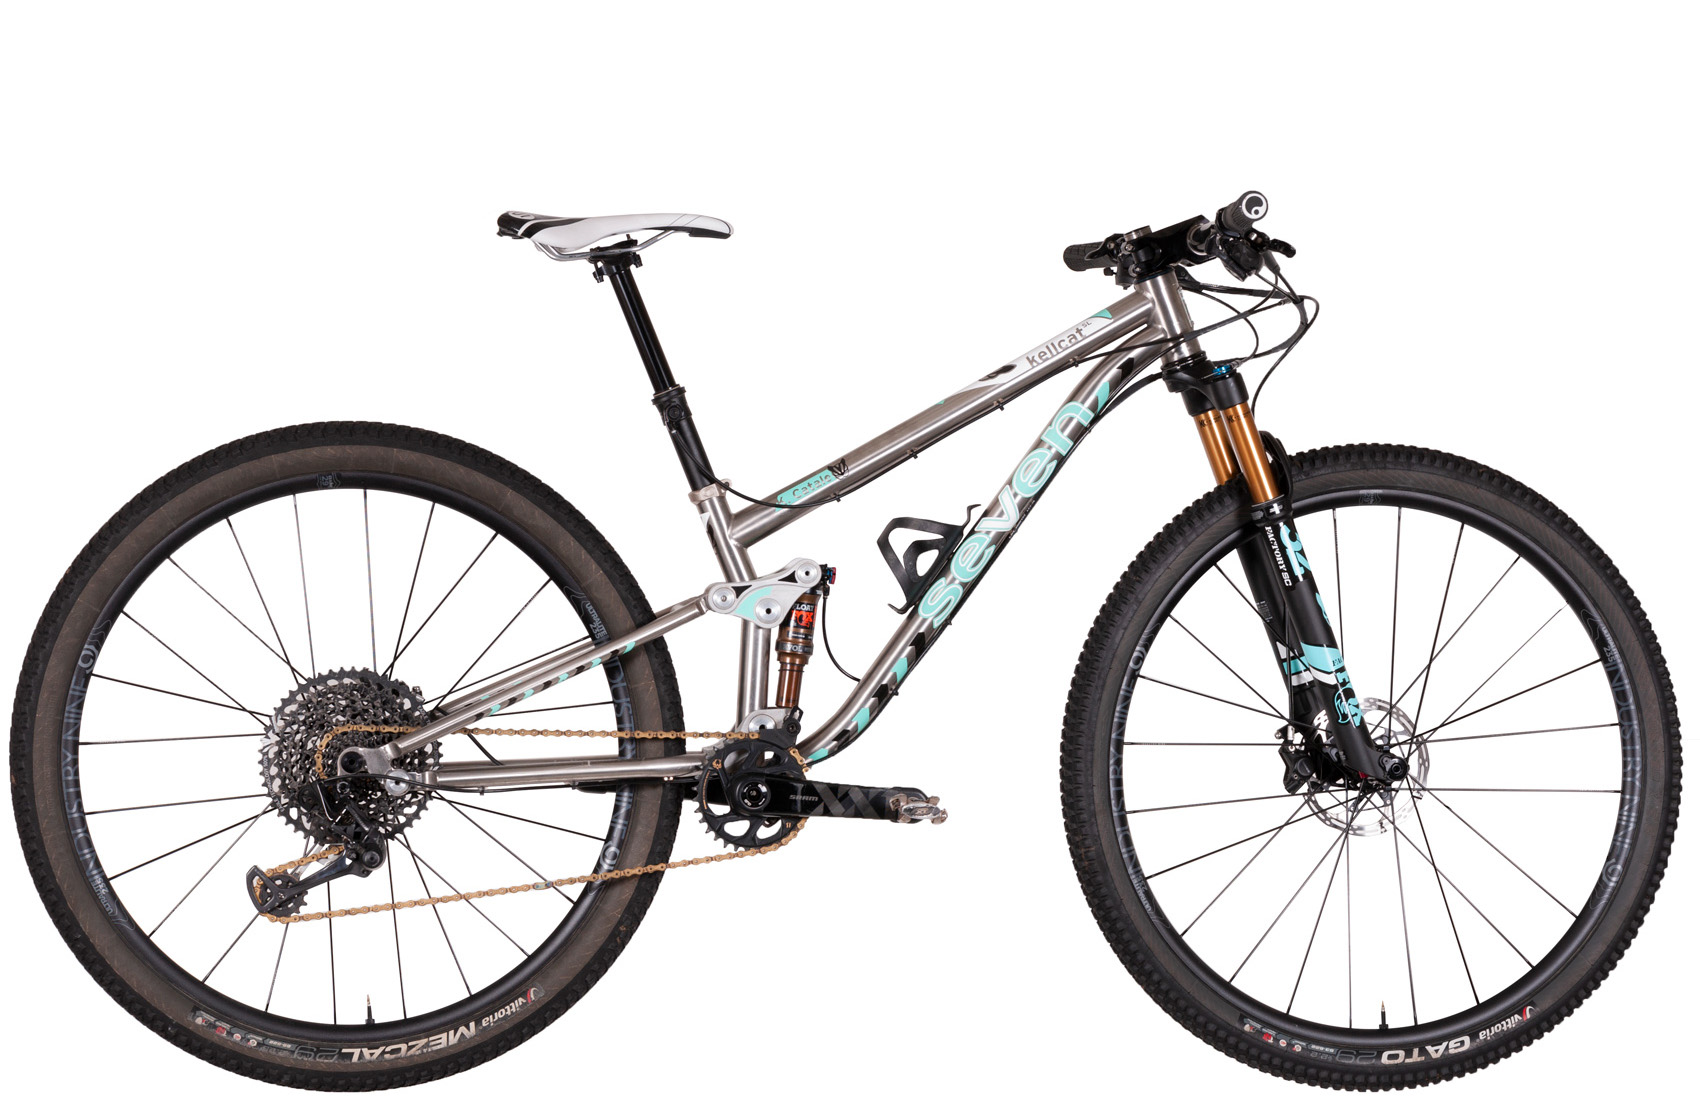 7a331c4adbf KellCat SL. double-butted titanium dual suspension race bike